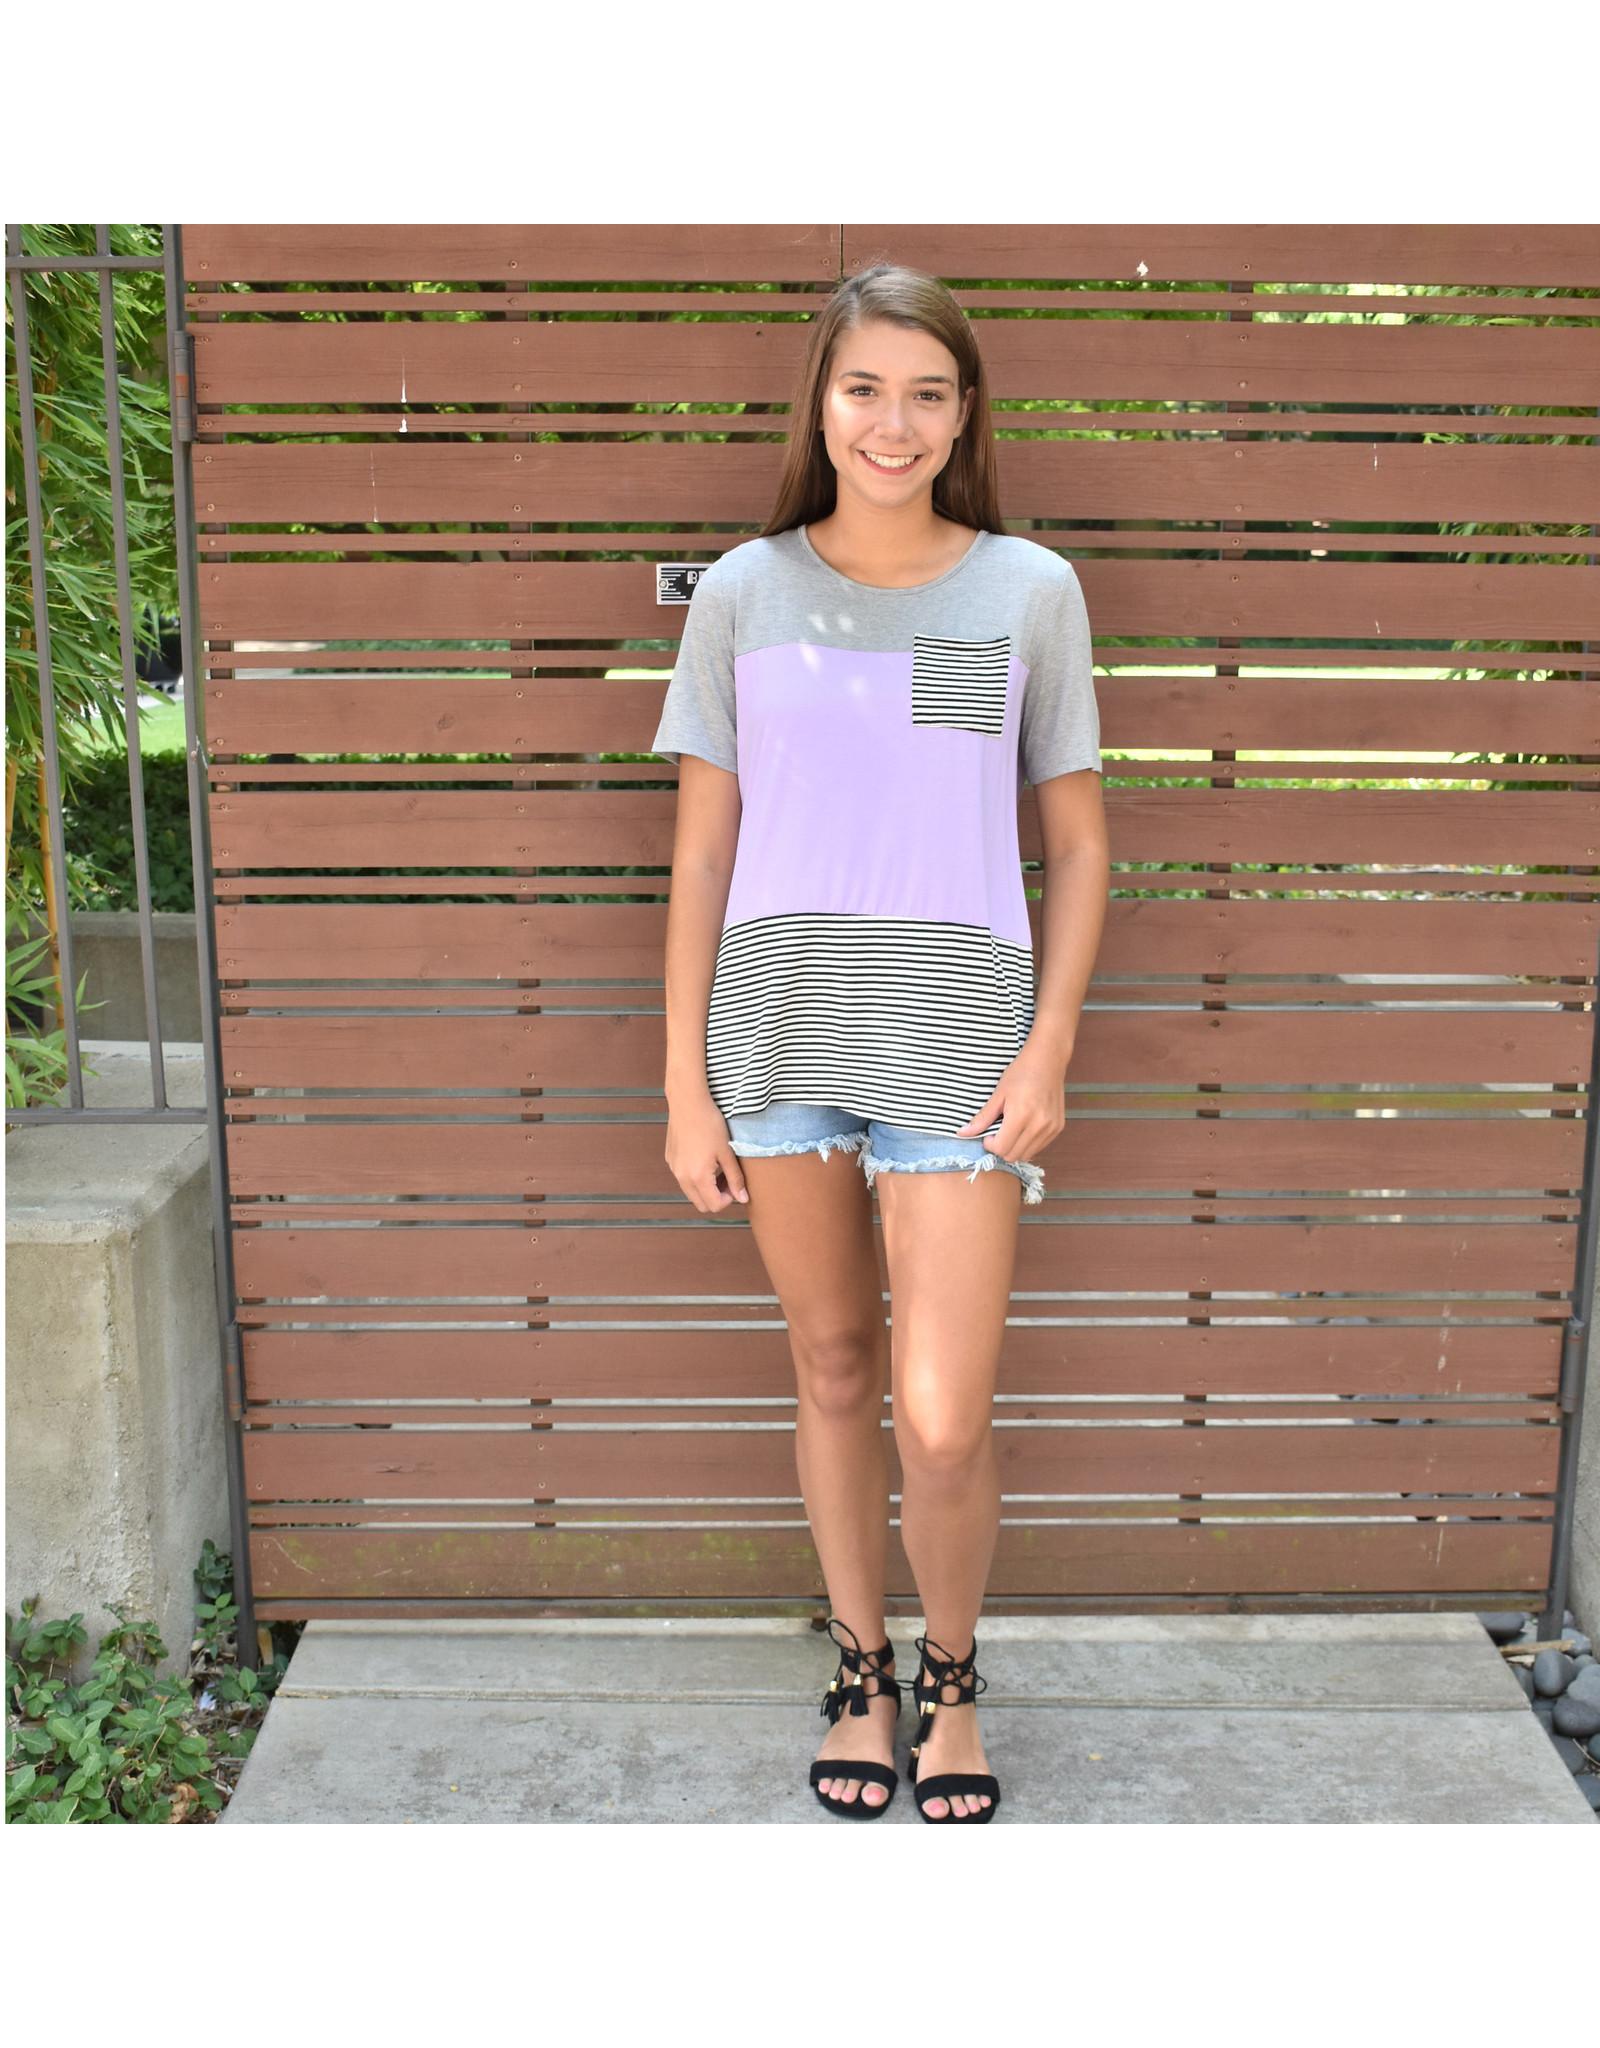 Lyla's: Clothing, Decor & More Lavender Colorblock Top